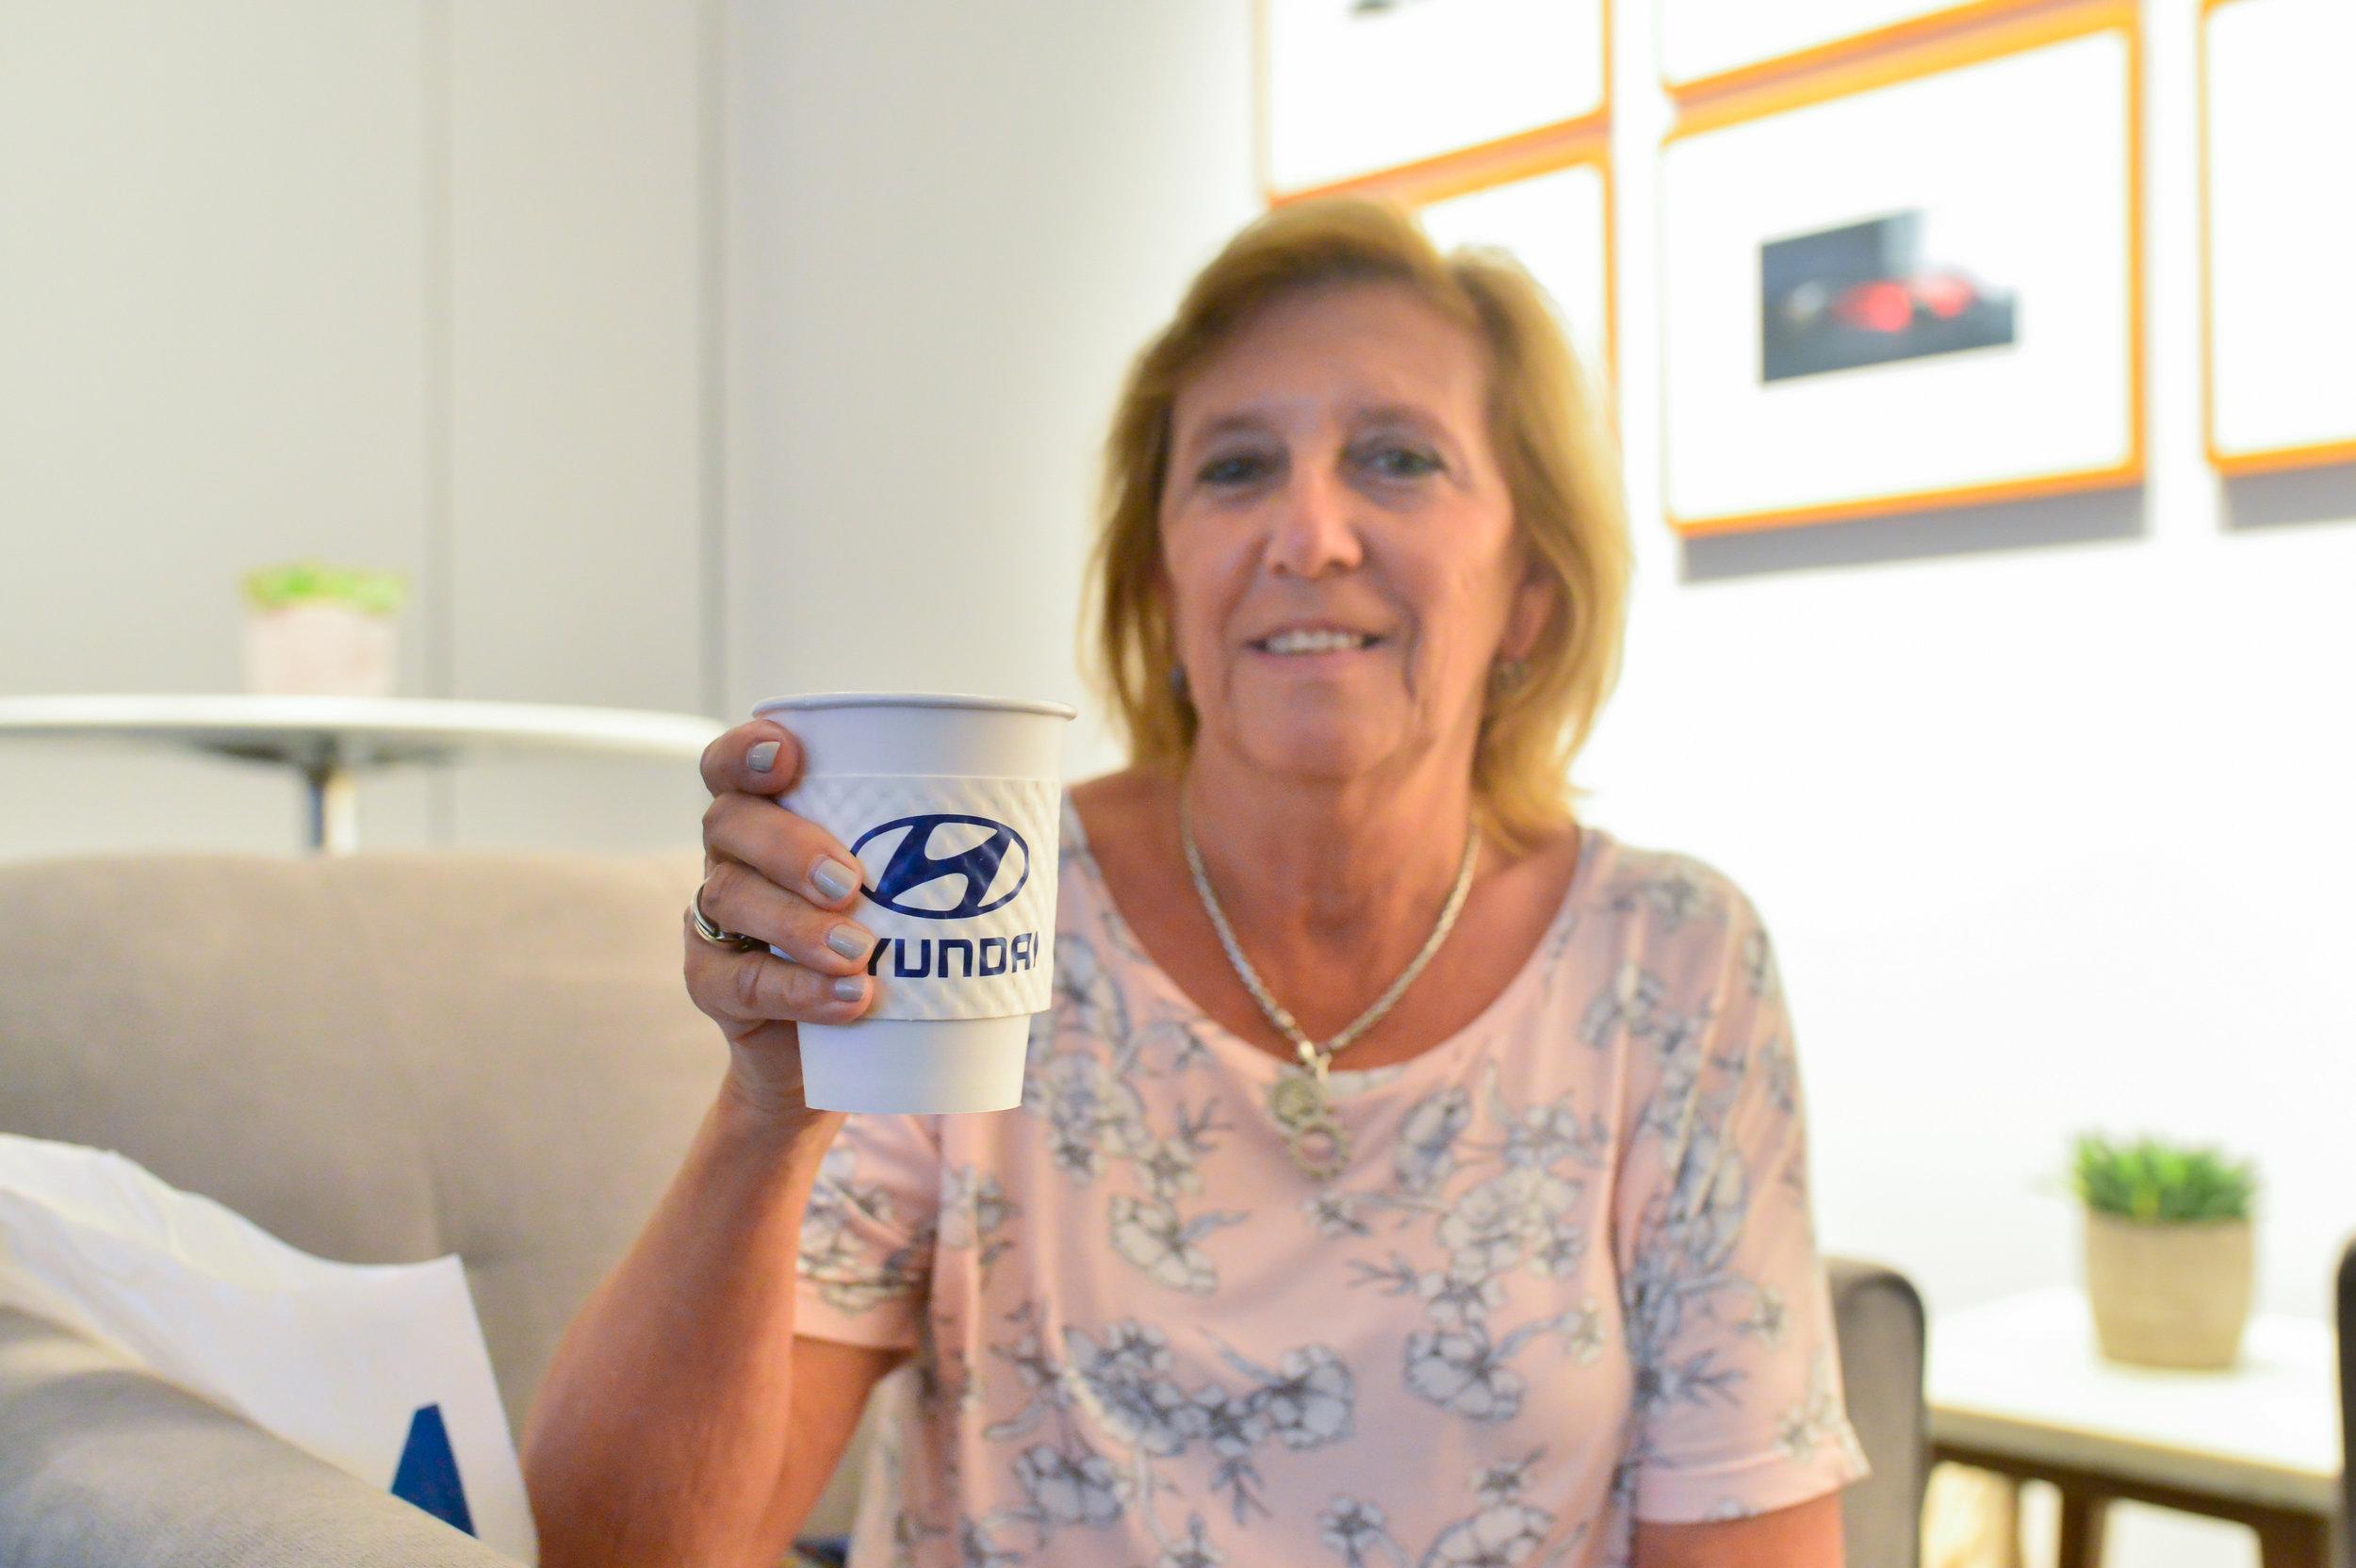 OHelloMedia-Hyundai-Christie'sAuctionHouse-6.26-TopSelect-5802.jpg